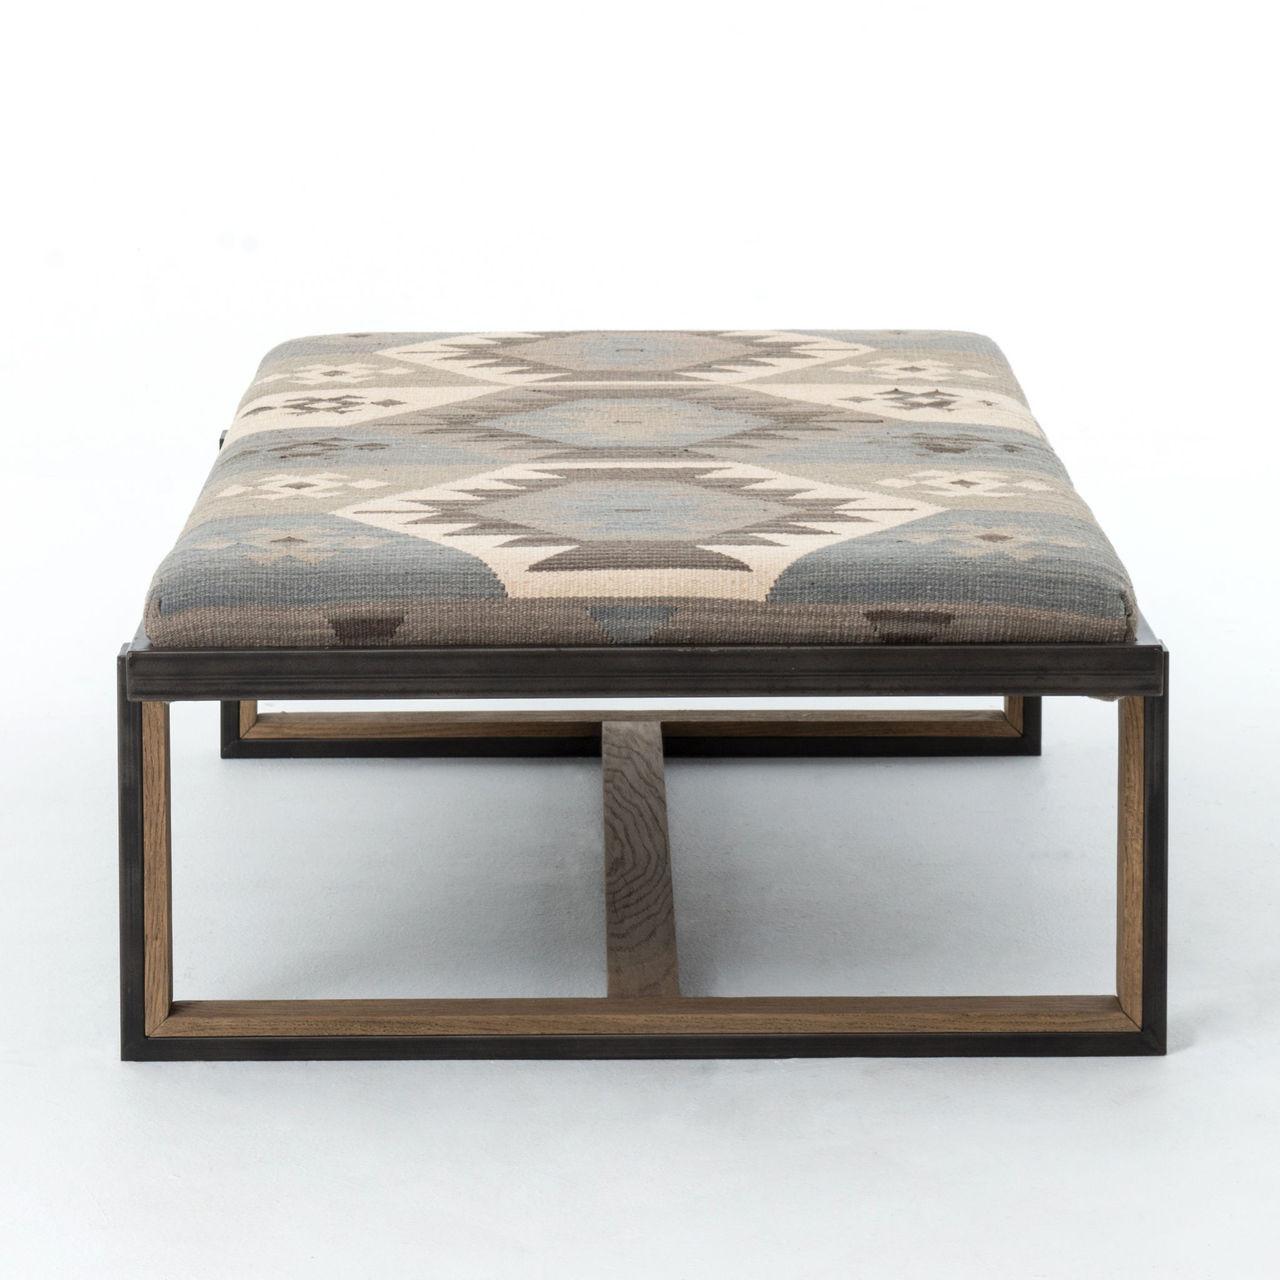 upholstered ottoman coffee table - Upholstered Ottoman